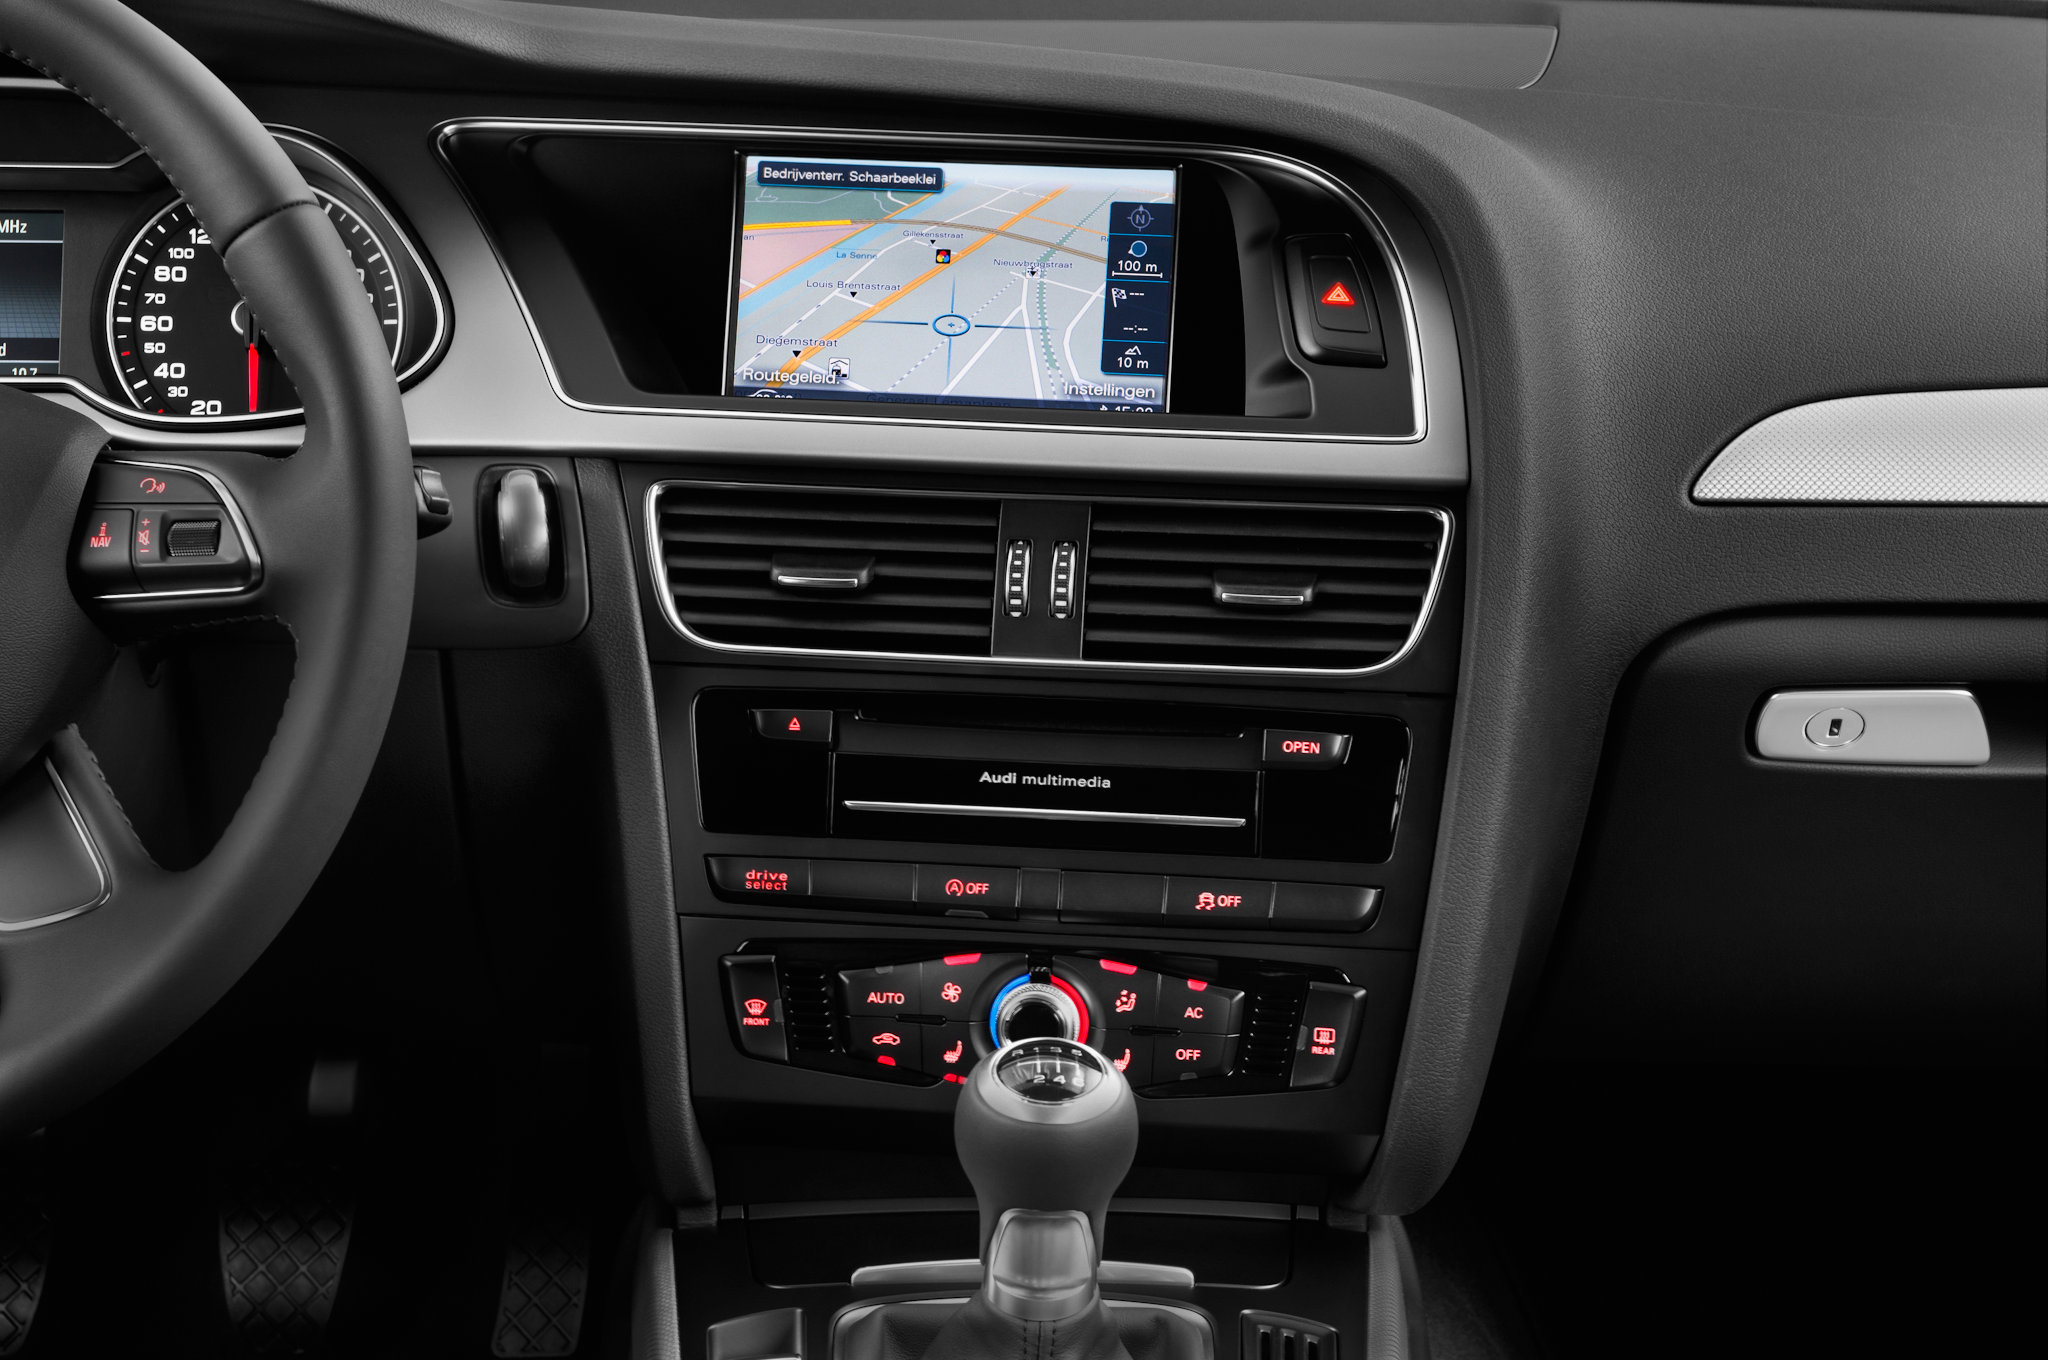 2013 Audi A4 Premium Plus Editors Notebook Automobile Magazine 2014 Fuse Box 33 34